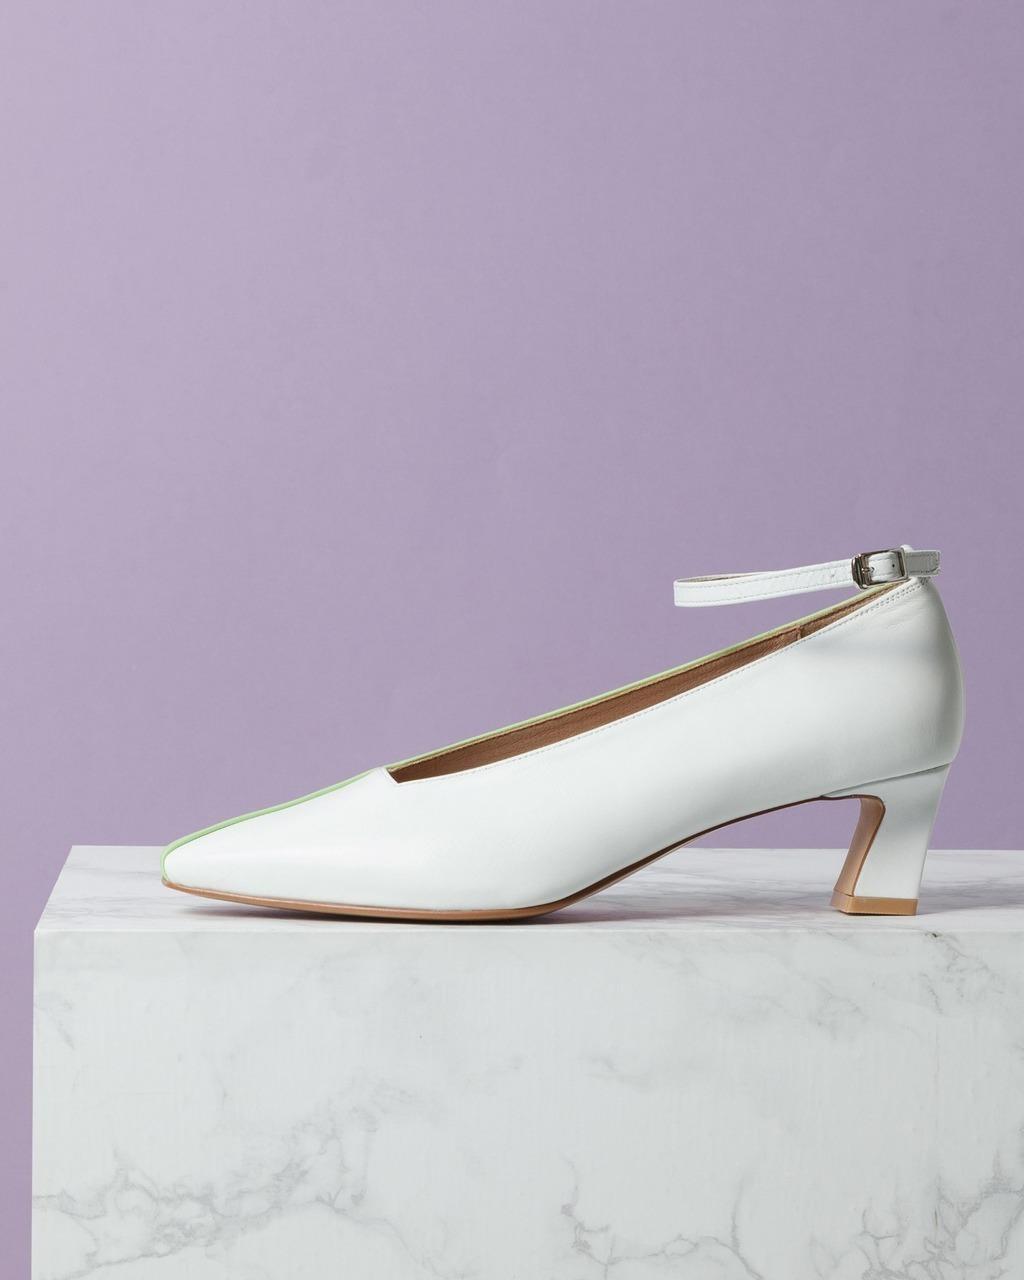 DORATORE Sacchi White-Mint - Women's Shoes : Republic of Korea